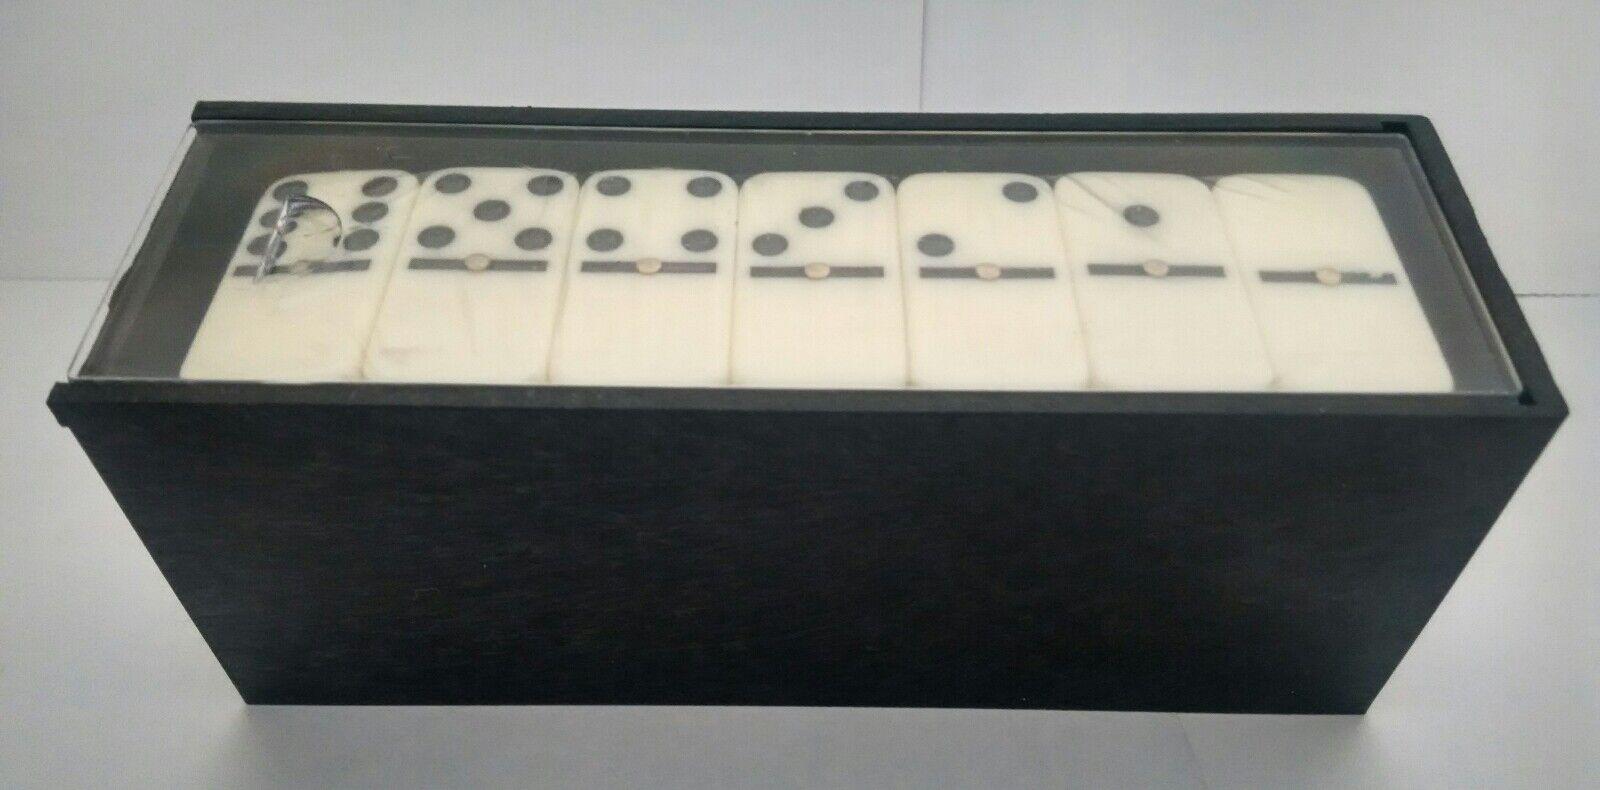 Domino Farbe marfil juego juego juego de mesa en caja de plastico e2389e